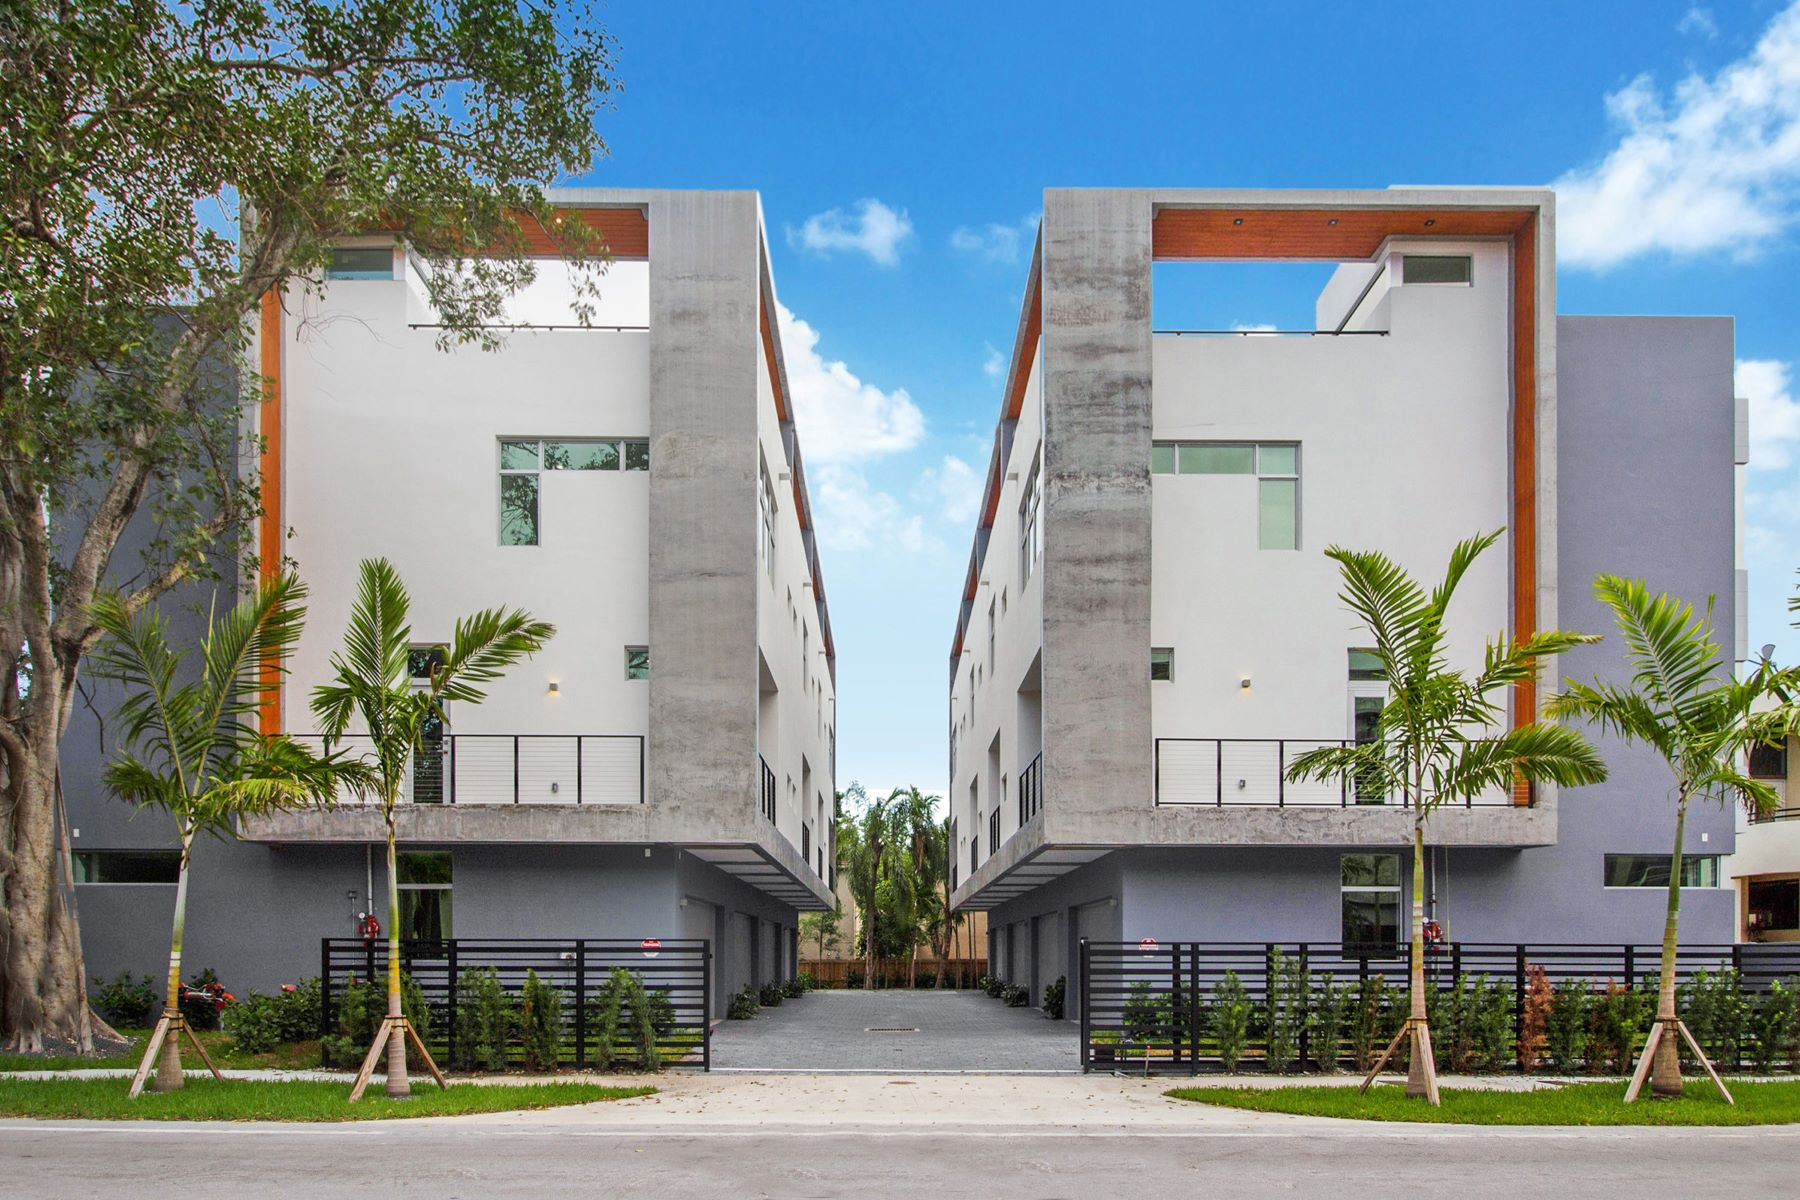 townhouses por un Venta en 2926 Bird Avenue 1 Coconut Grove, Florida 33133 Estados Unidos